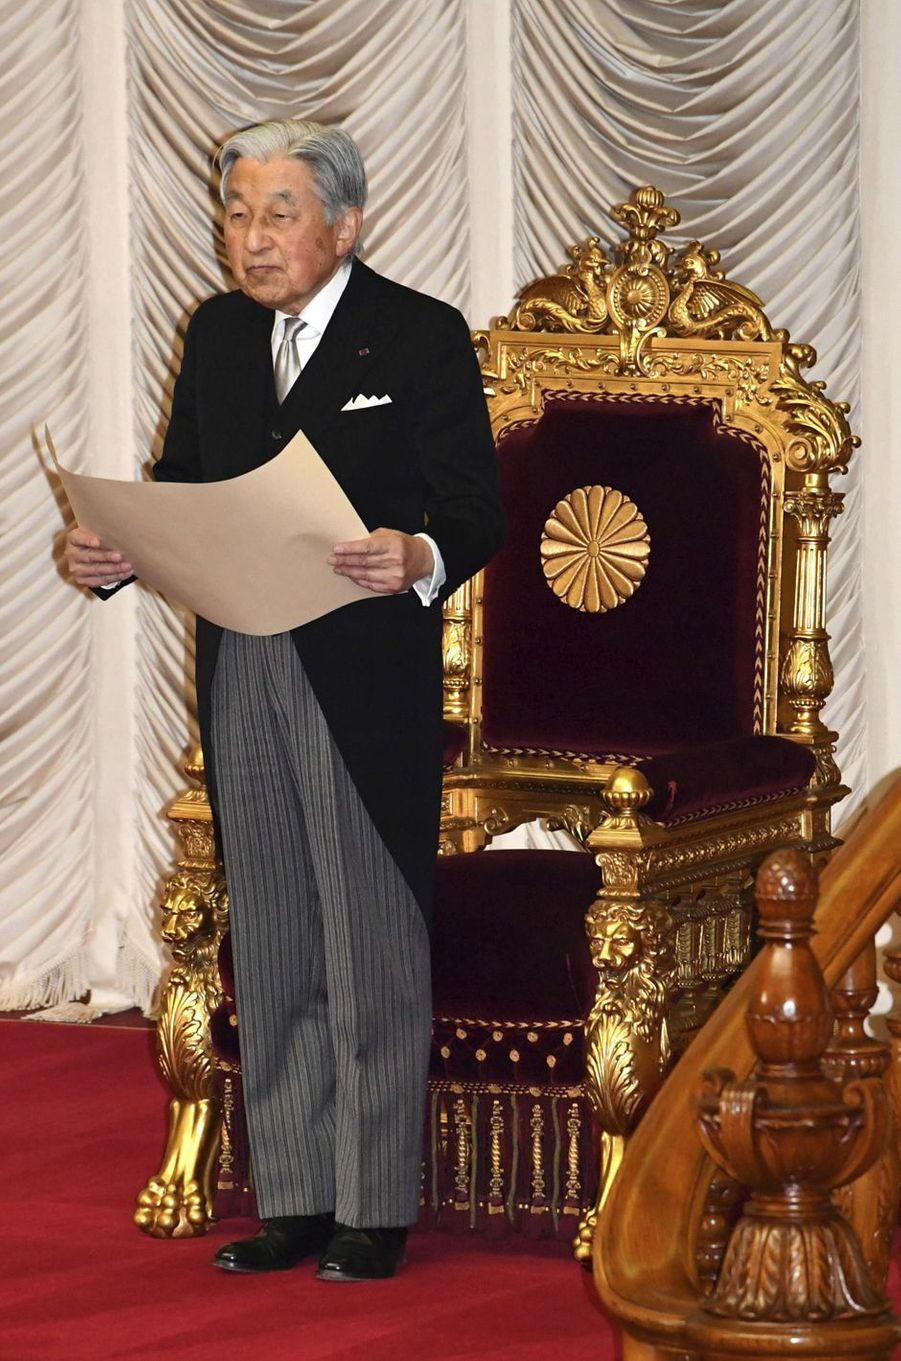 L'empereur Akihito du Japon, le 28 janvier 2019